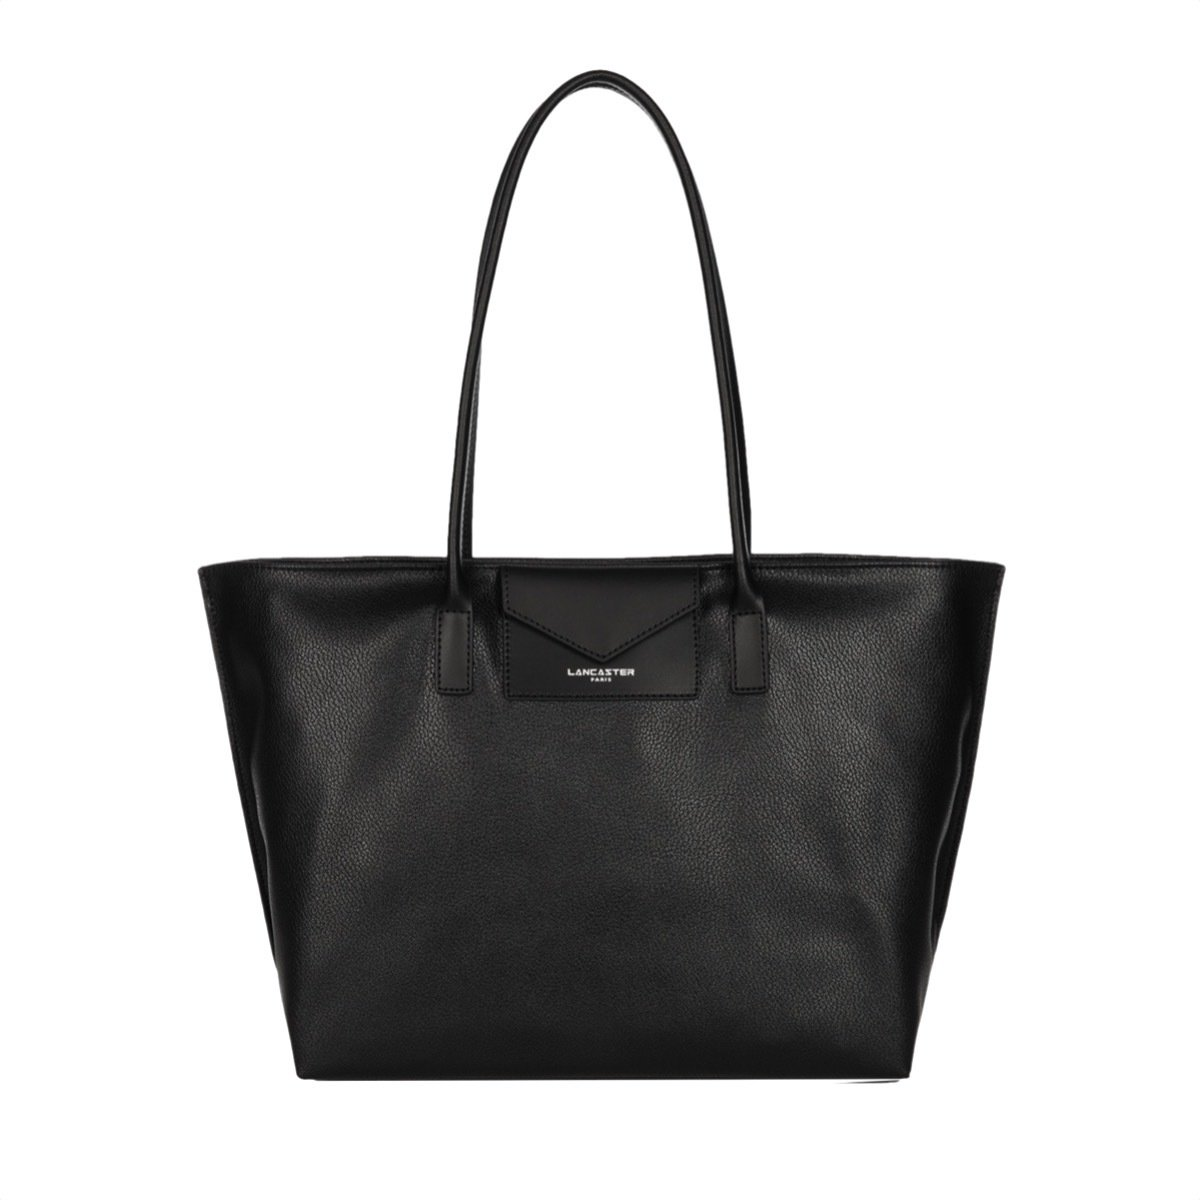 LANCASTER - Maya Medium Tote bag - Noir